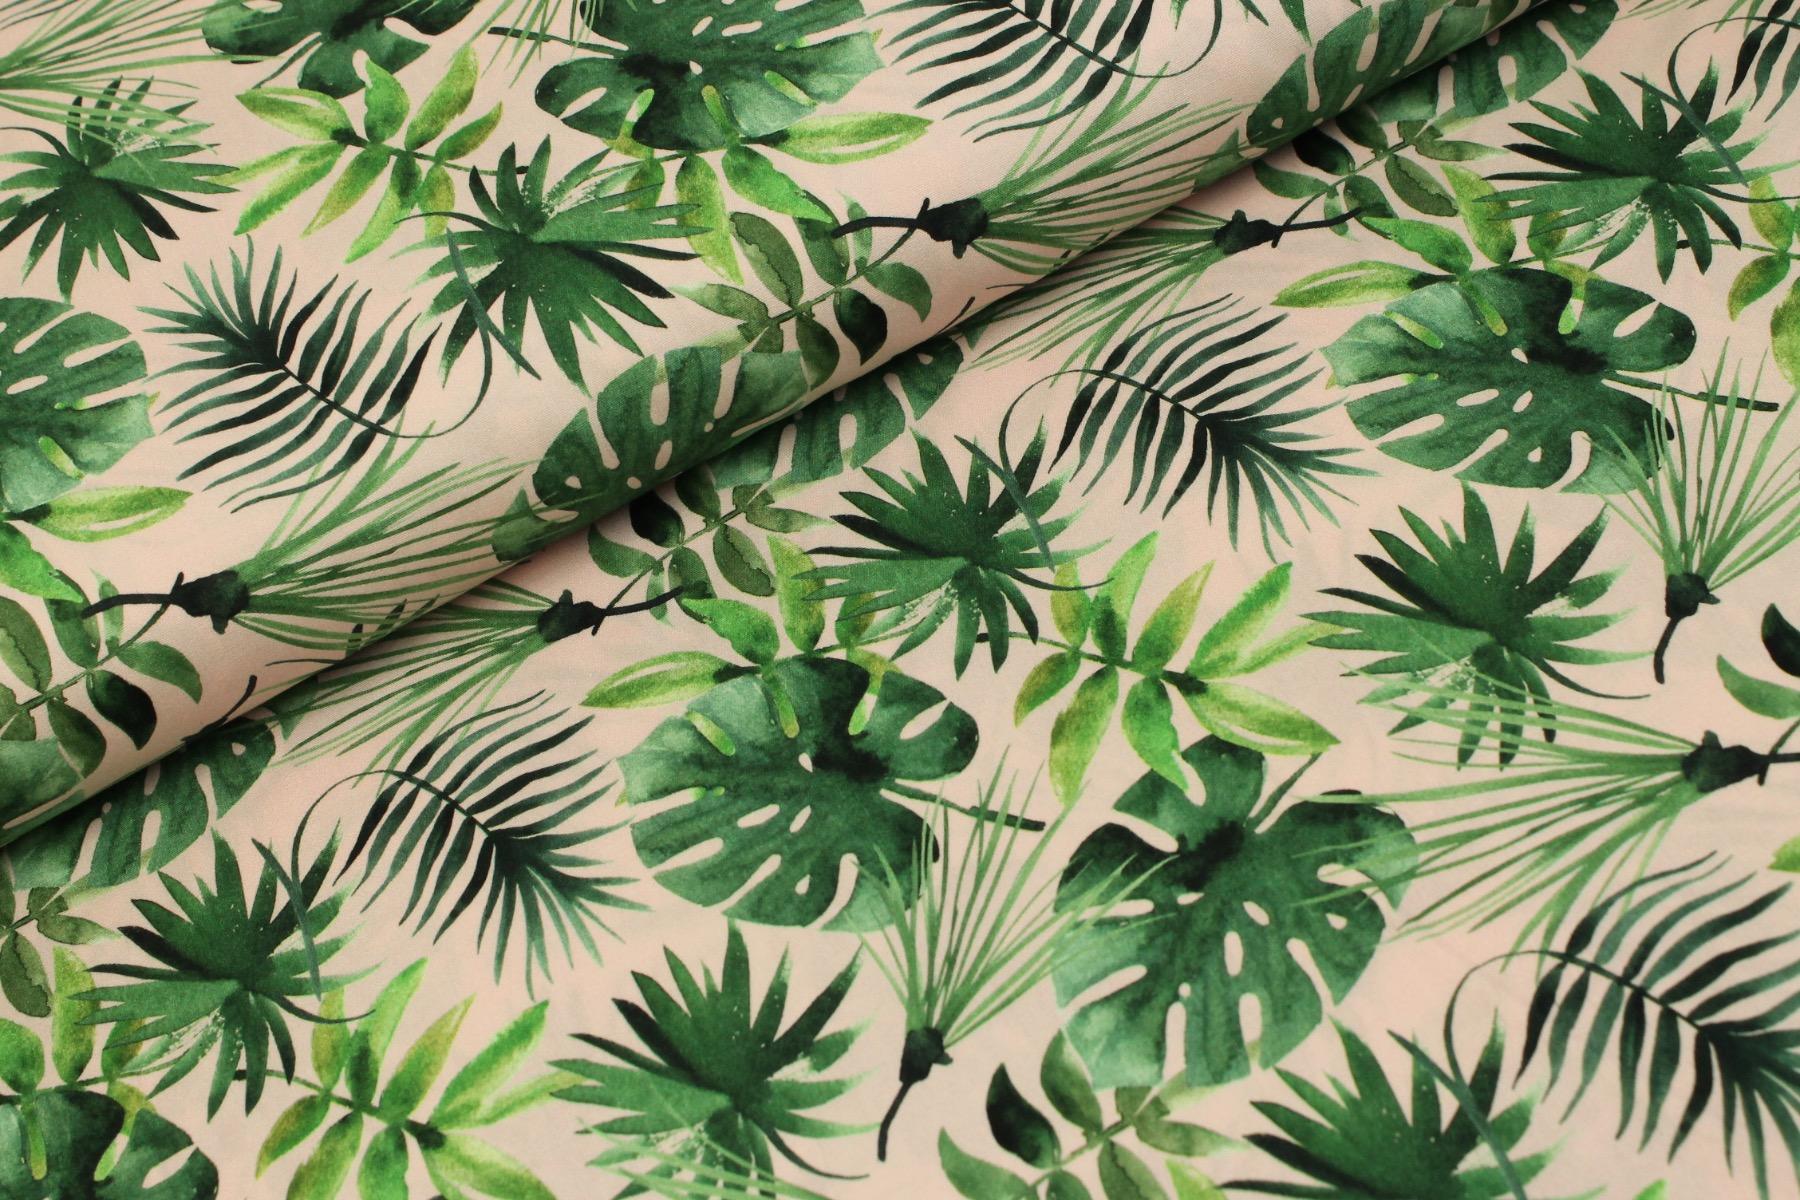 Forest Leaves Katoen Roze - Stenzo